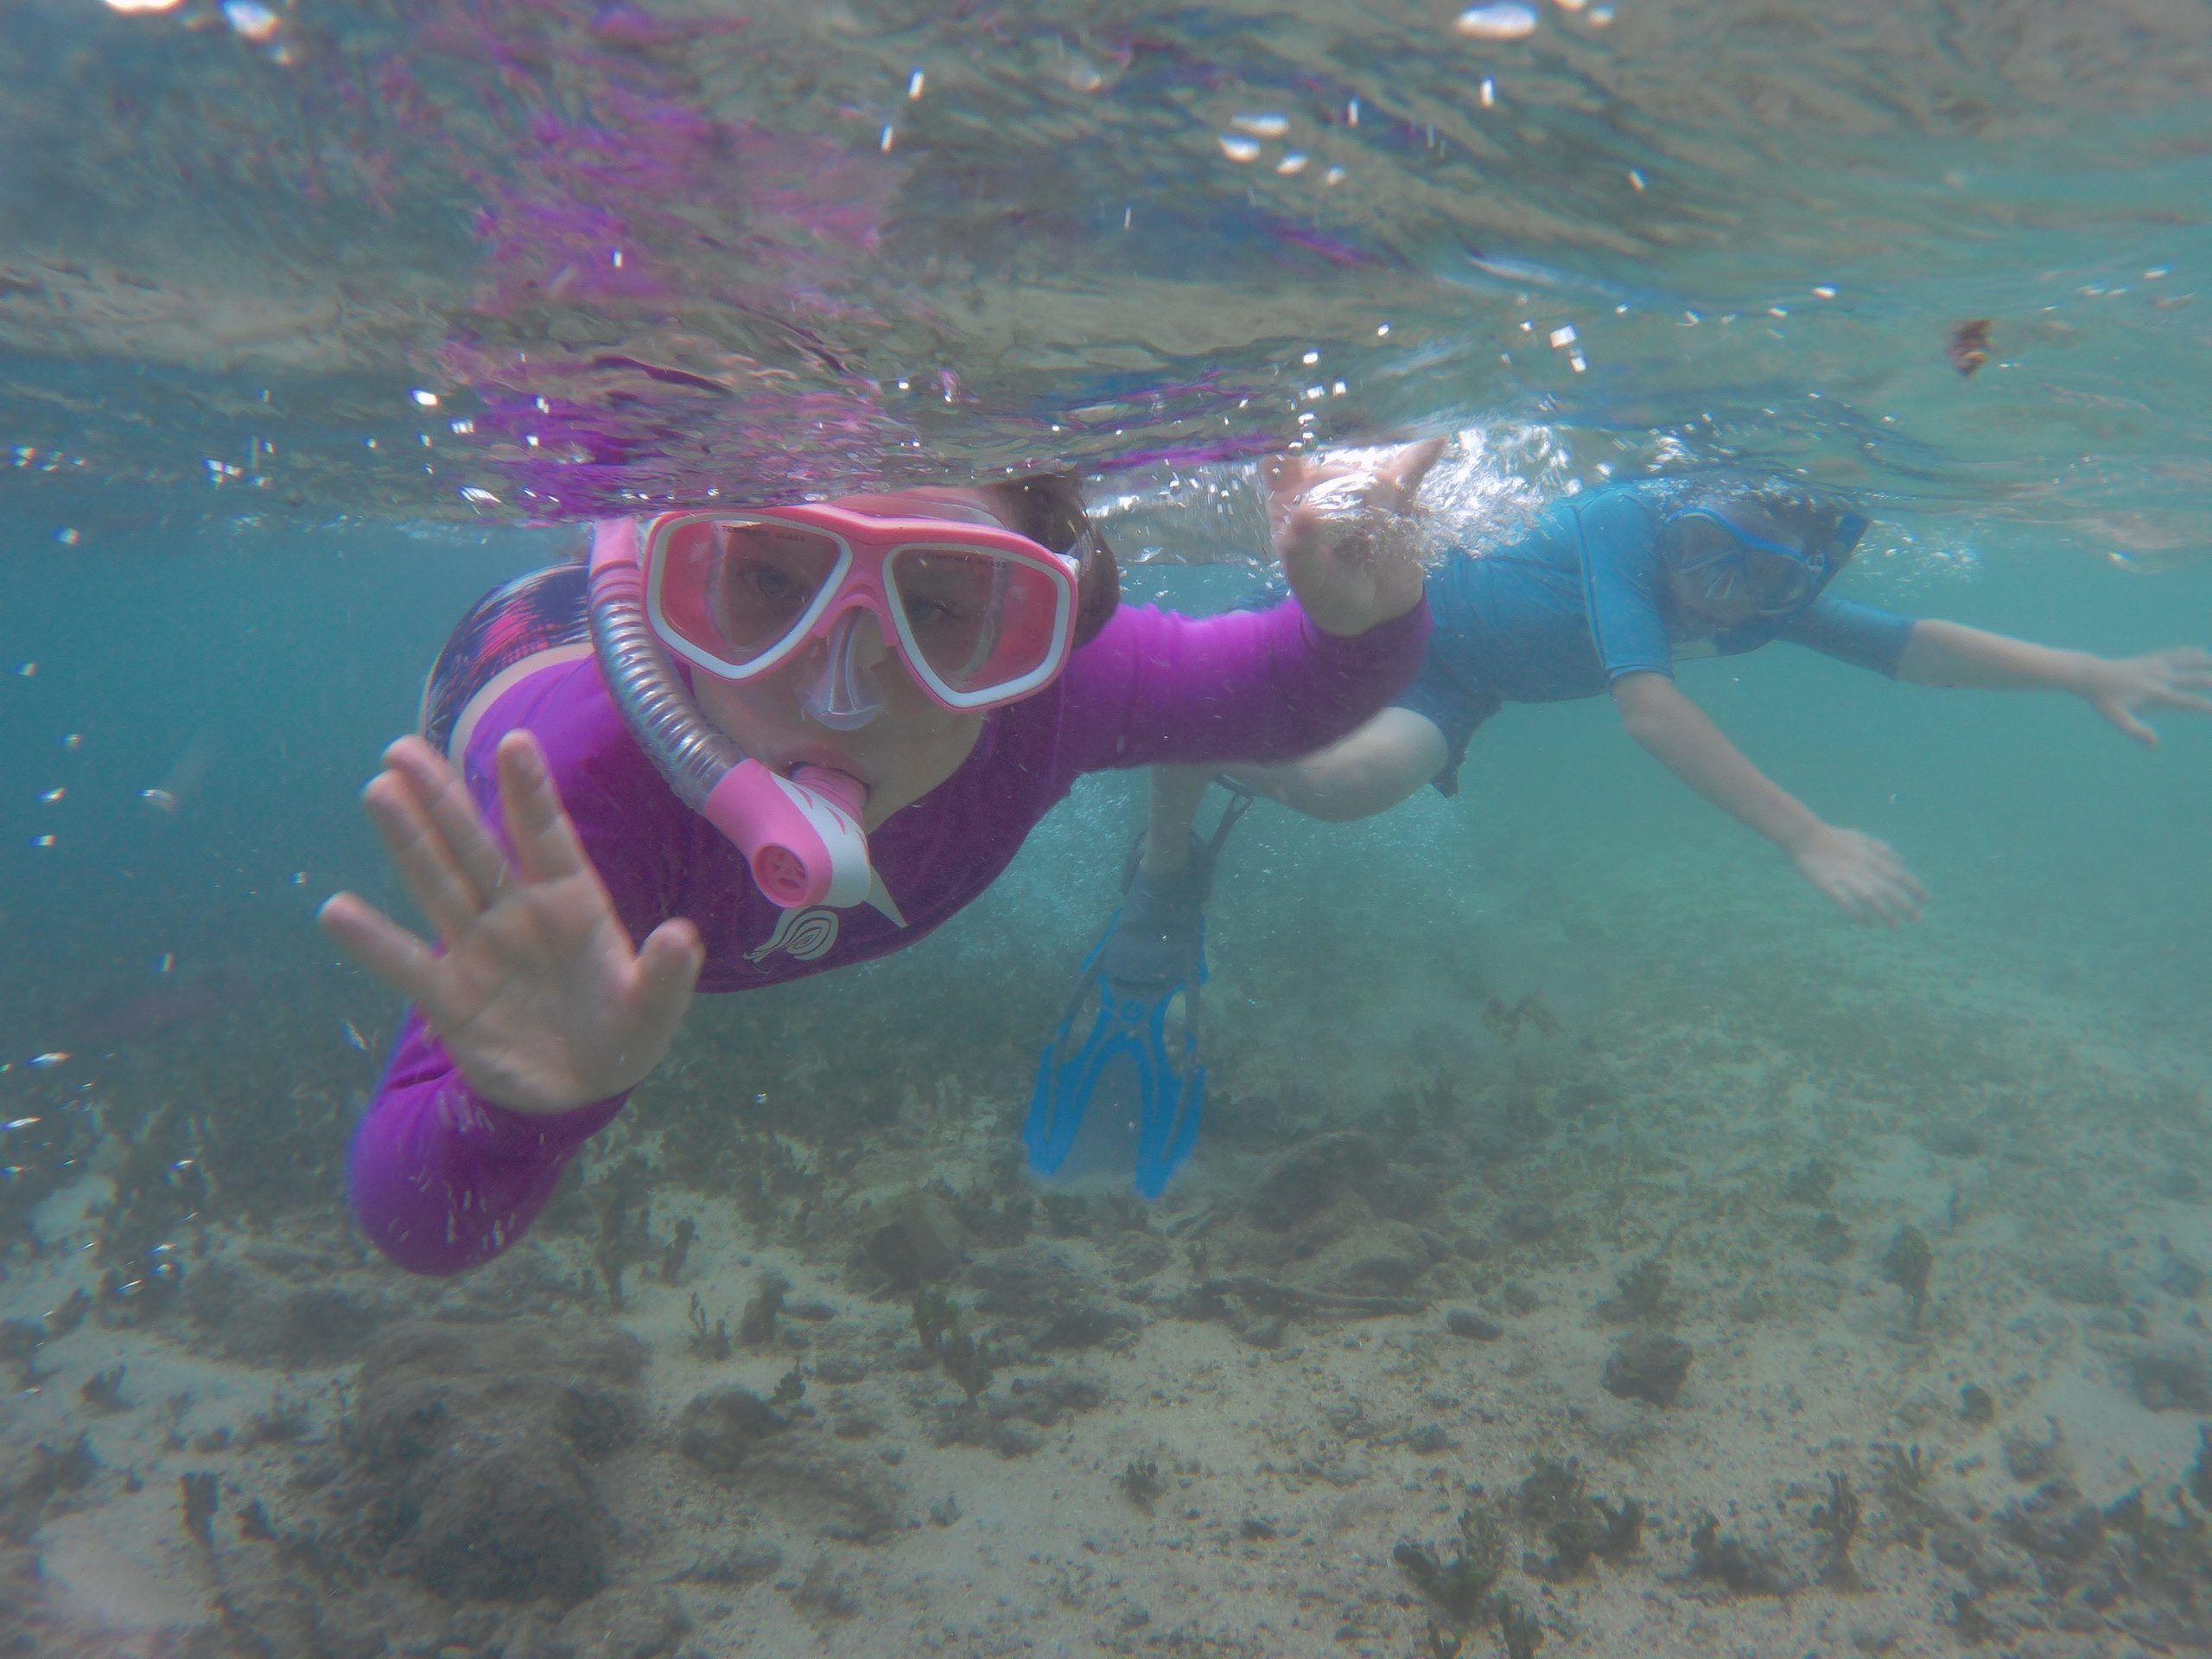 Best Kids Snorkel Set - Guide & Reviews (2021) - Chasing ...